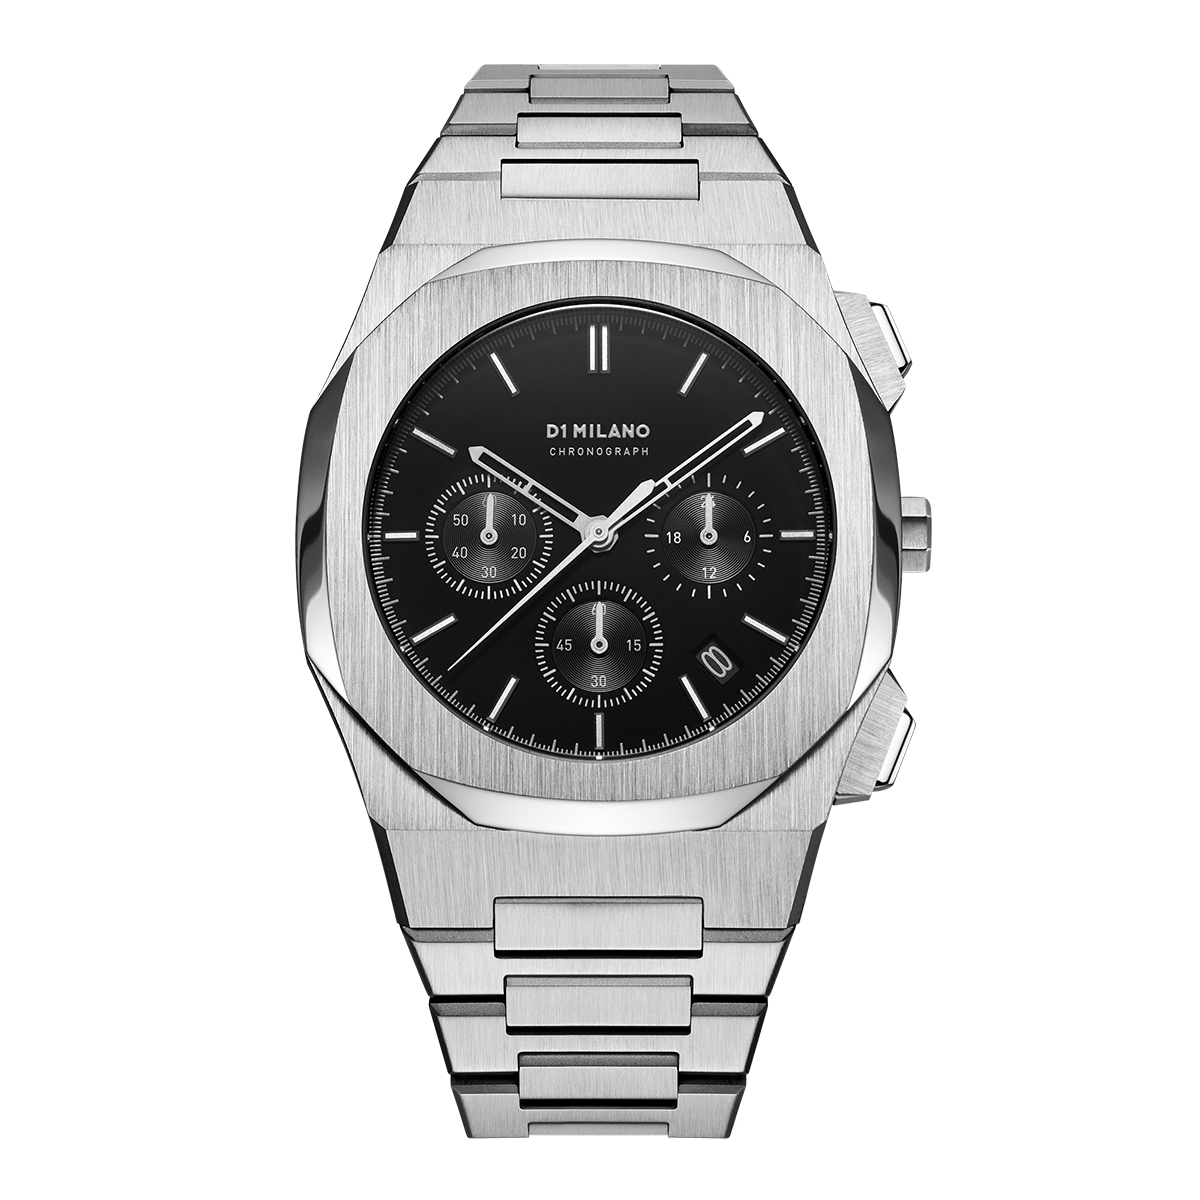 D1 MILANO ディーワンミラノ D1 MILANO Chronograph Black with Stainless Steel Bracelet